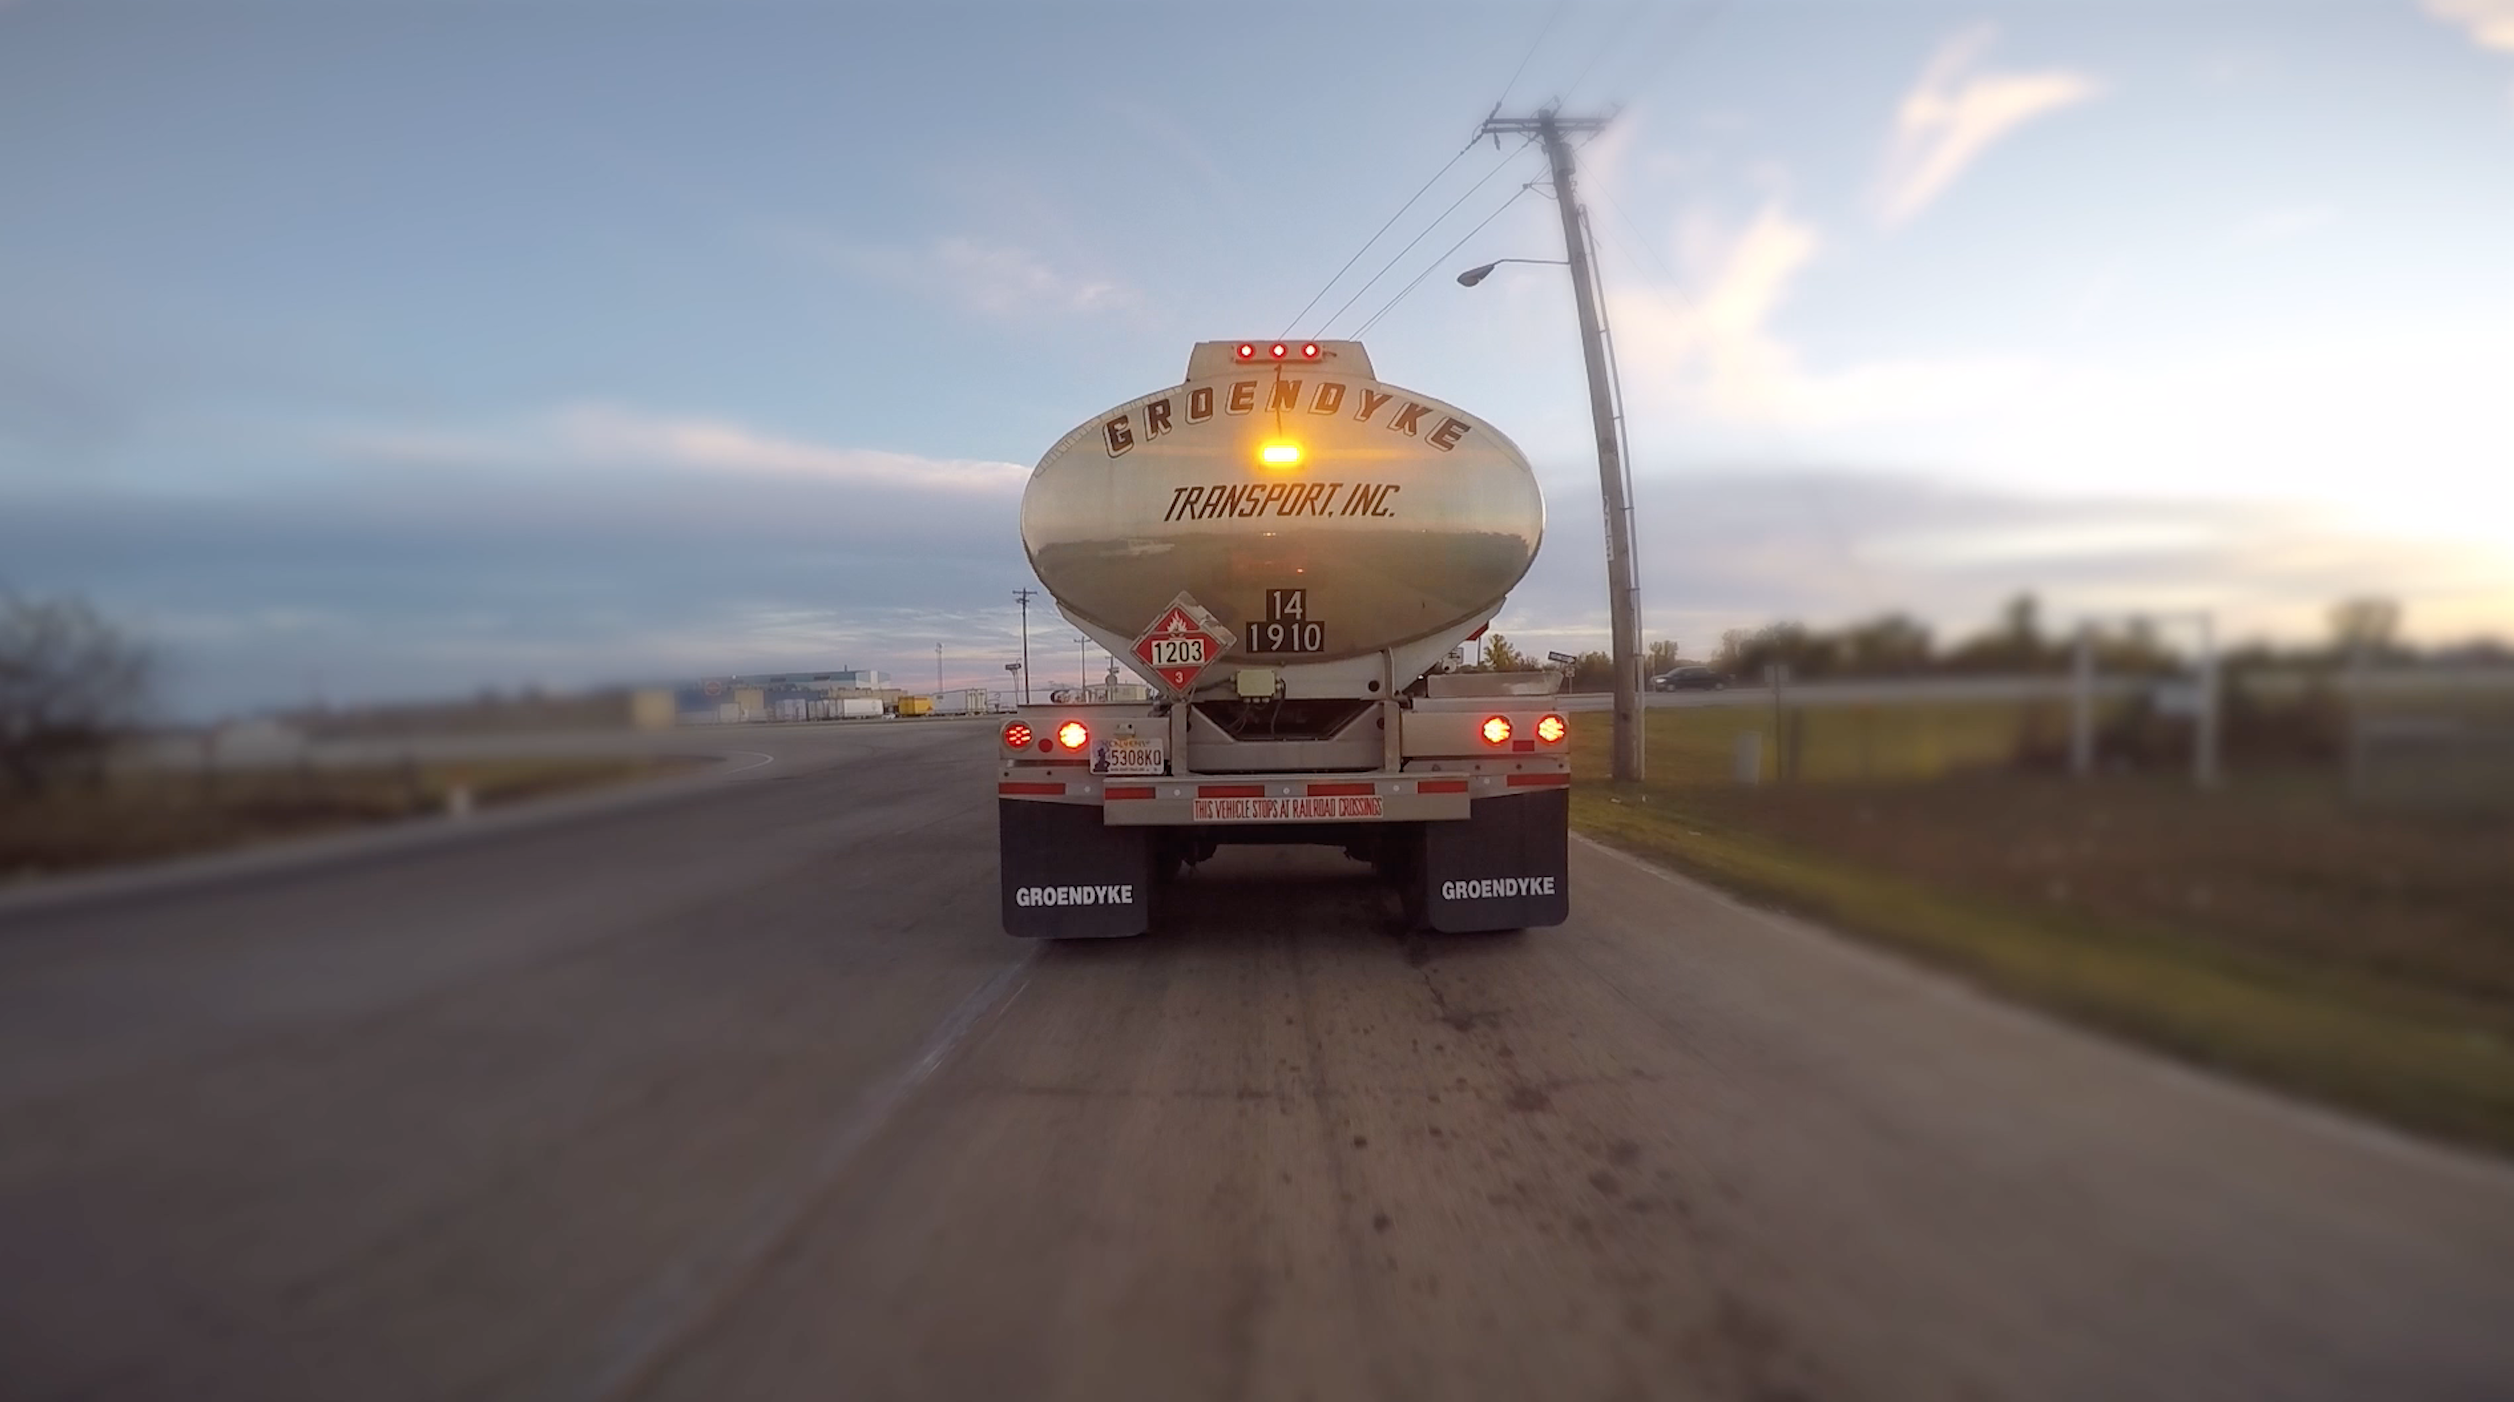 groendyke transport tanker featuring pulsating brake light